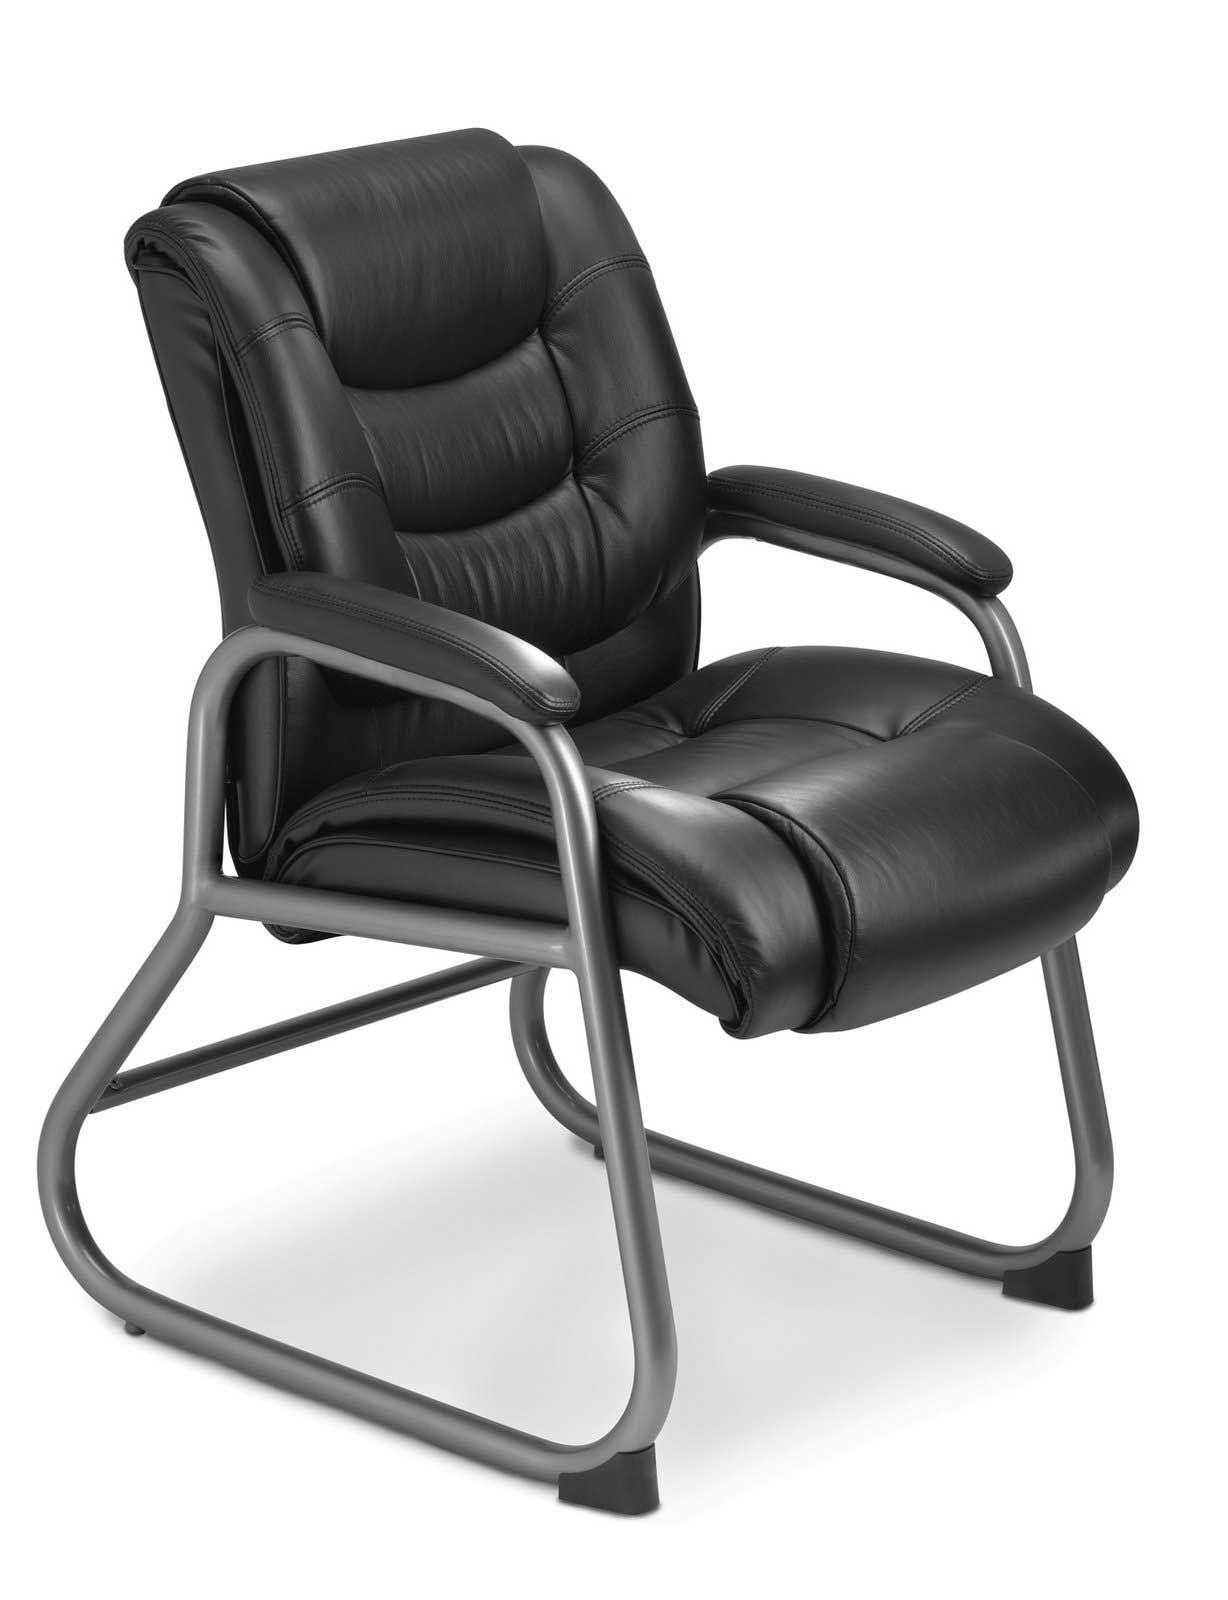 Komfortable Computer Stuhl | Stühle | Pinterest | Stuhl, Bequemer ...